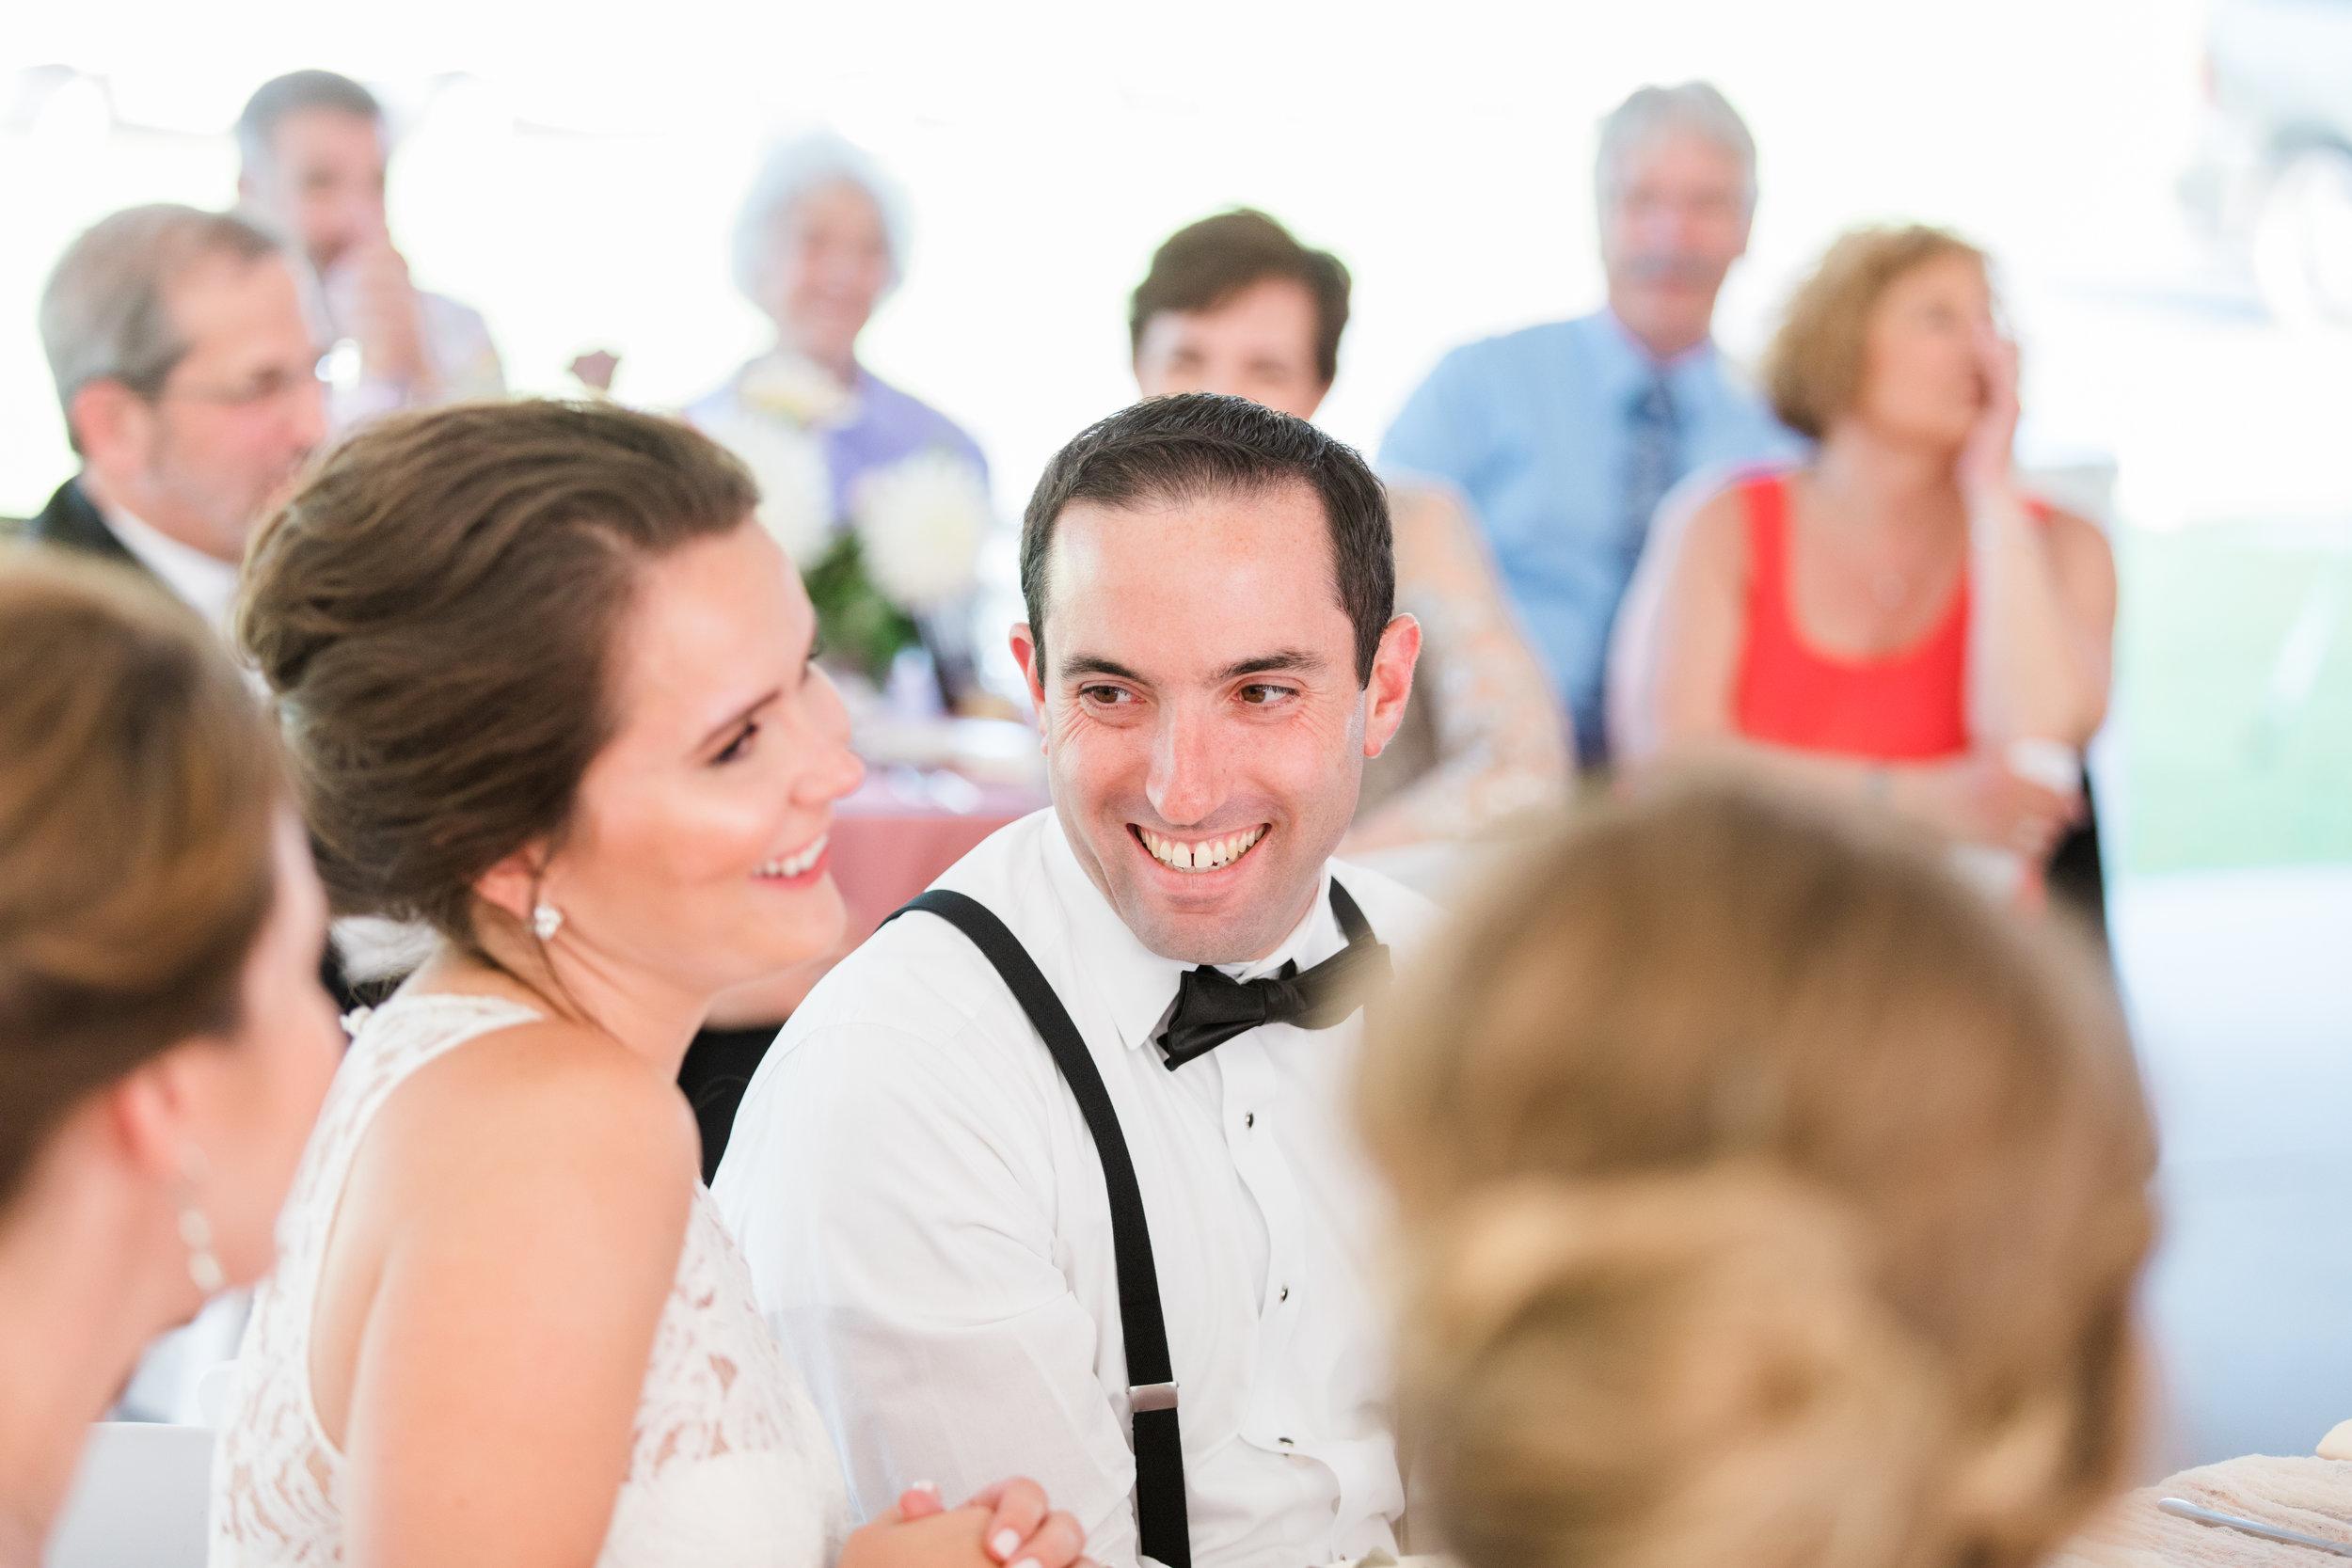 Zoller+Wedding+Reception+Toasts-16.jpg